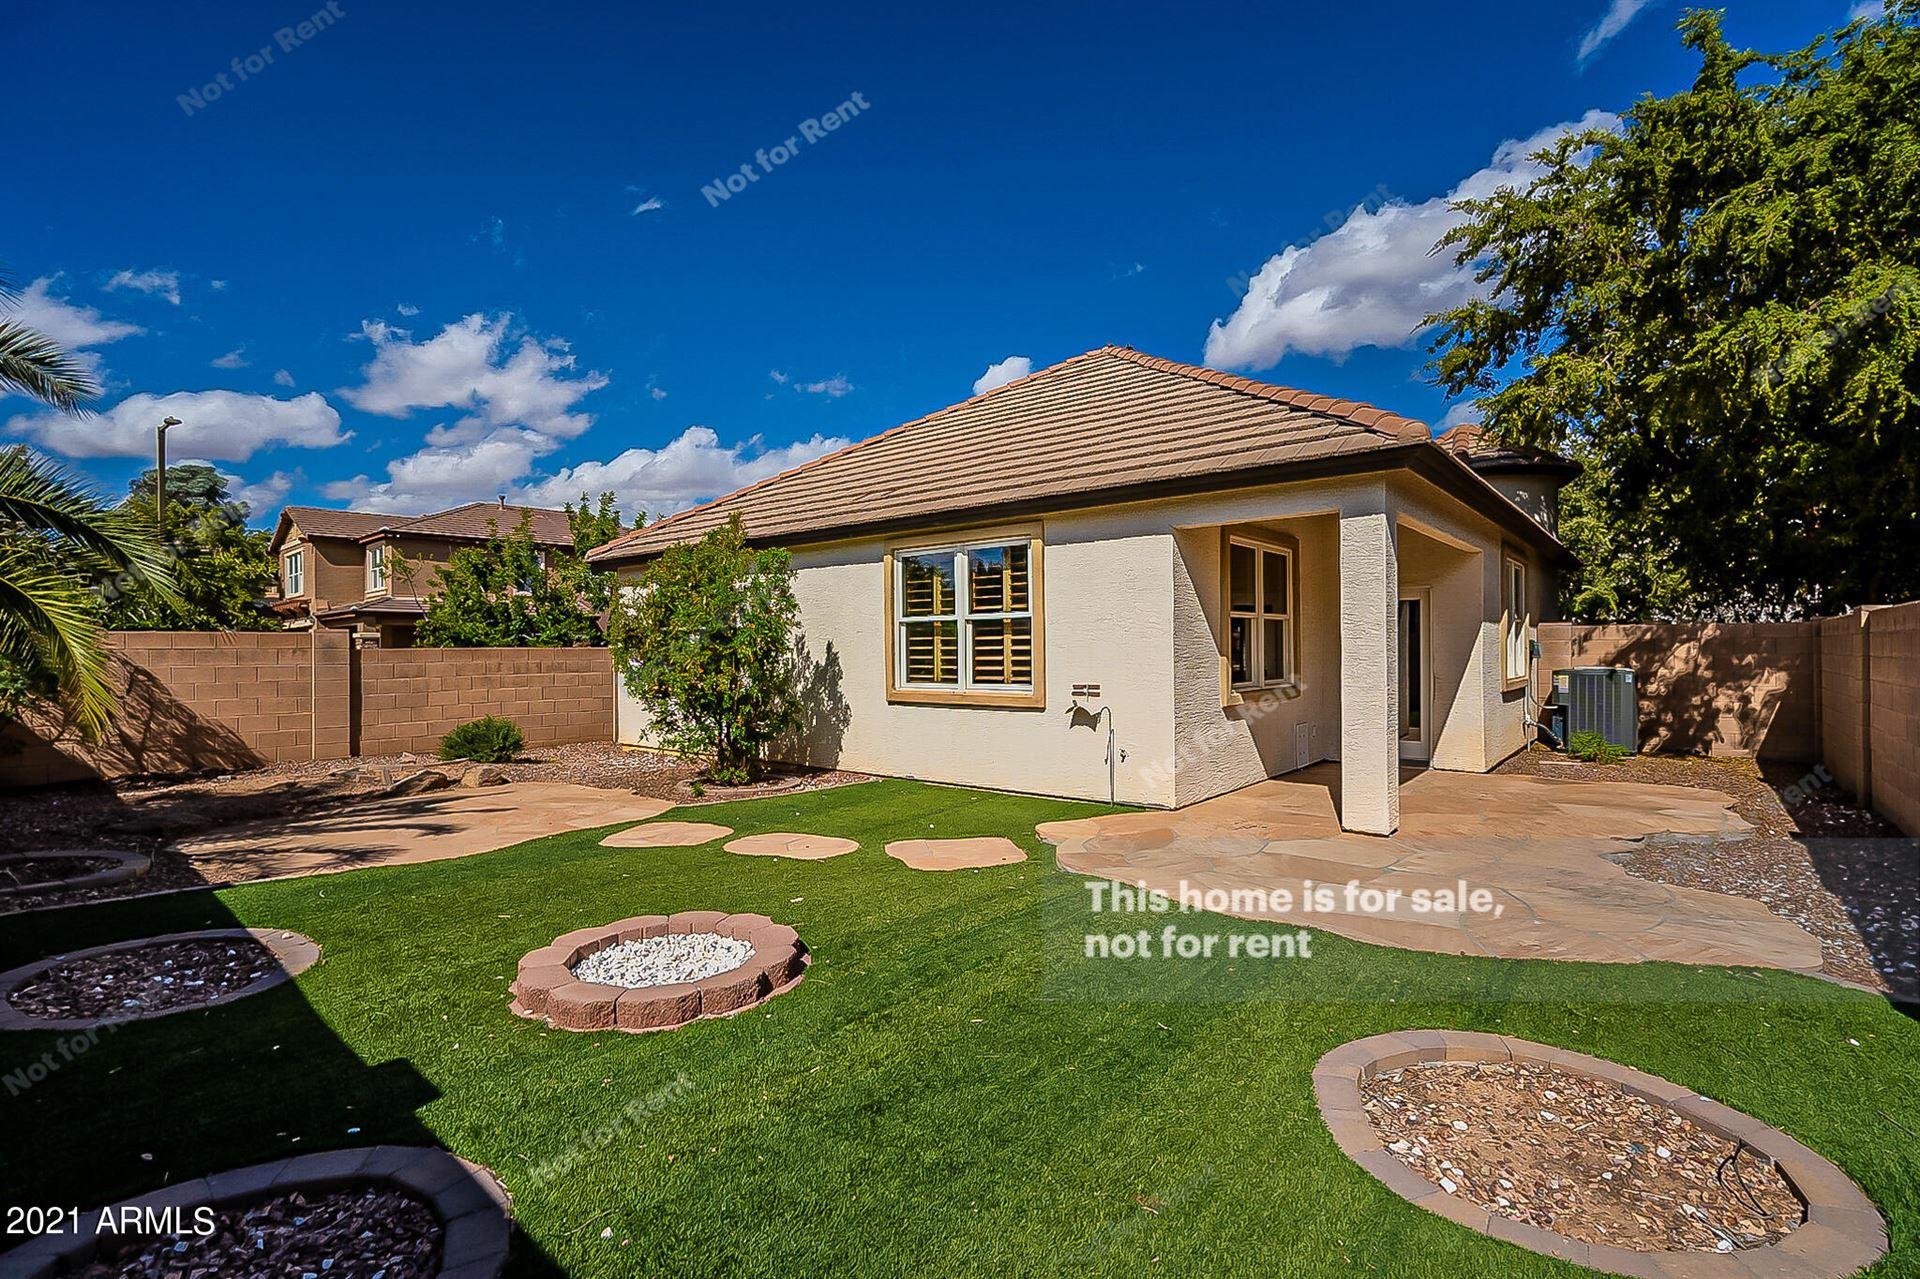 17257 W IRONWOOD Street, Surprise, AZ 85388 - #: 6311260